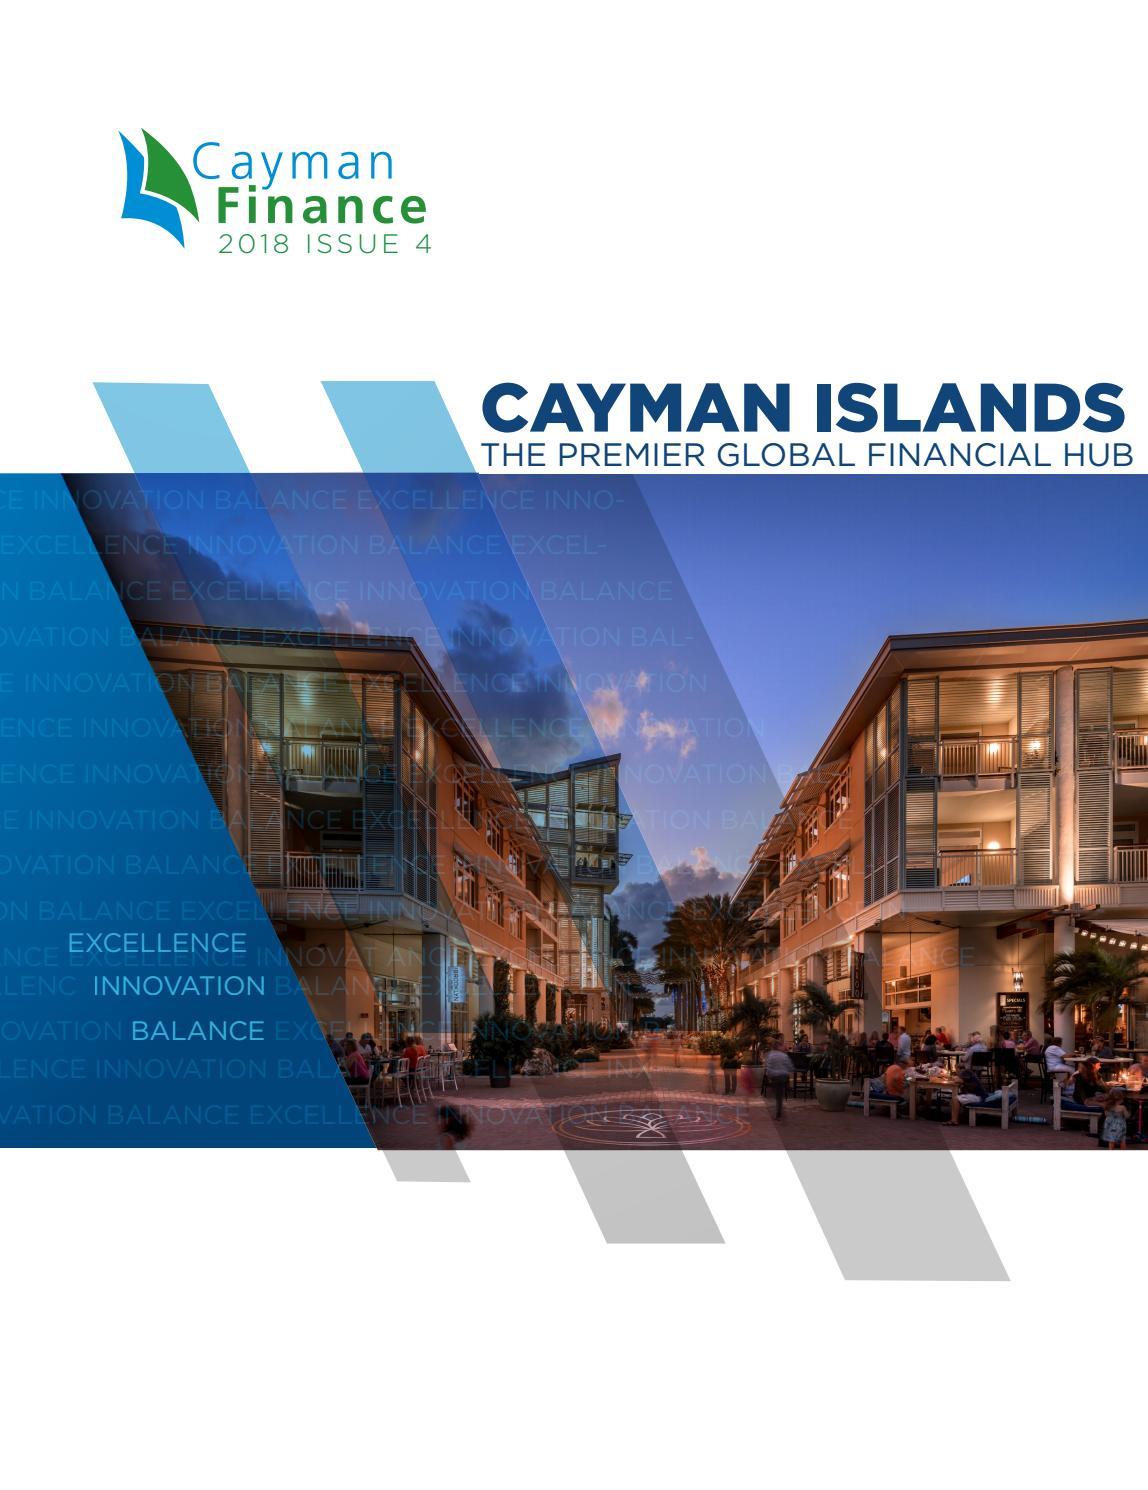 Cayman Finance Annual Magazine: Issue 4 by Cayman Finance - issuu